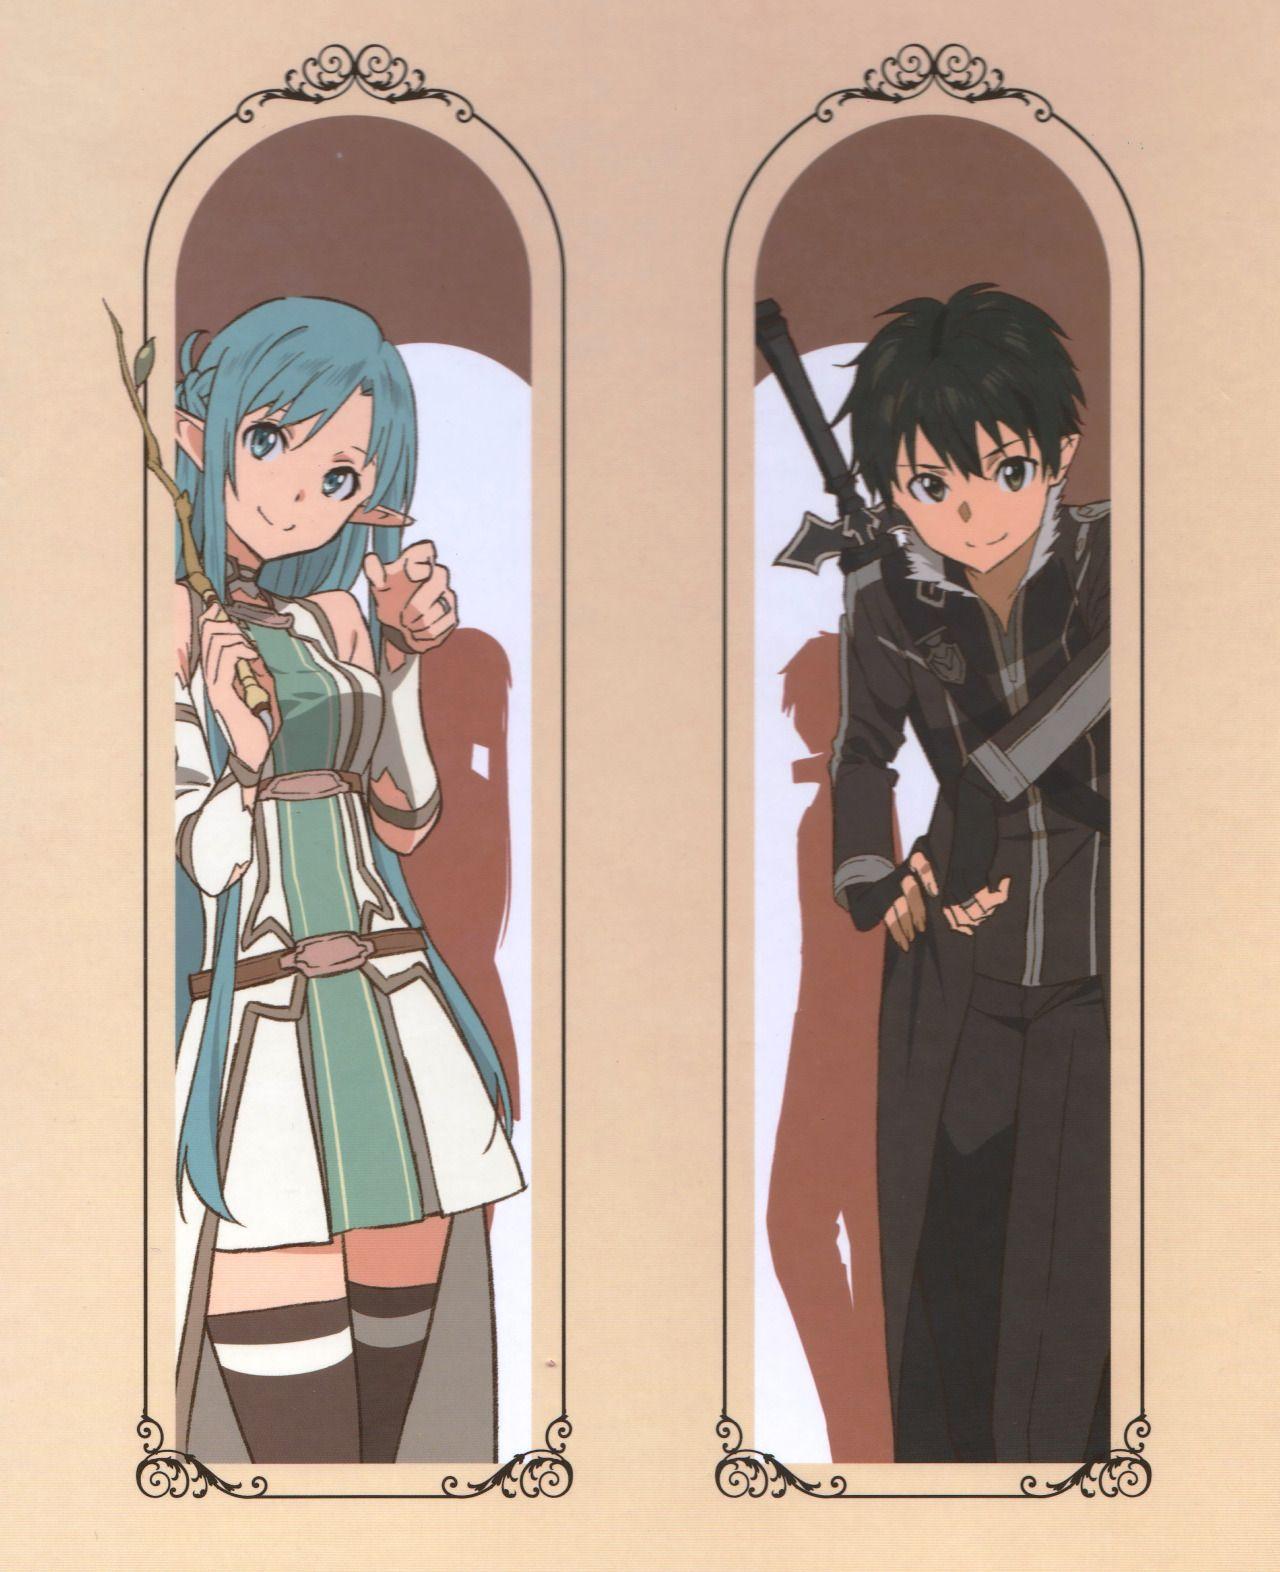 Kirito l Asuna | Sword Art Online | Pinterest | Kirito, Sword art ...